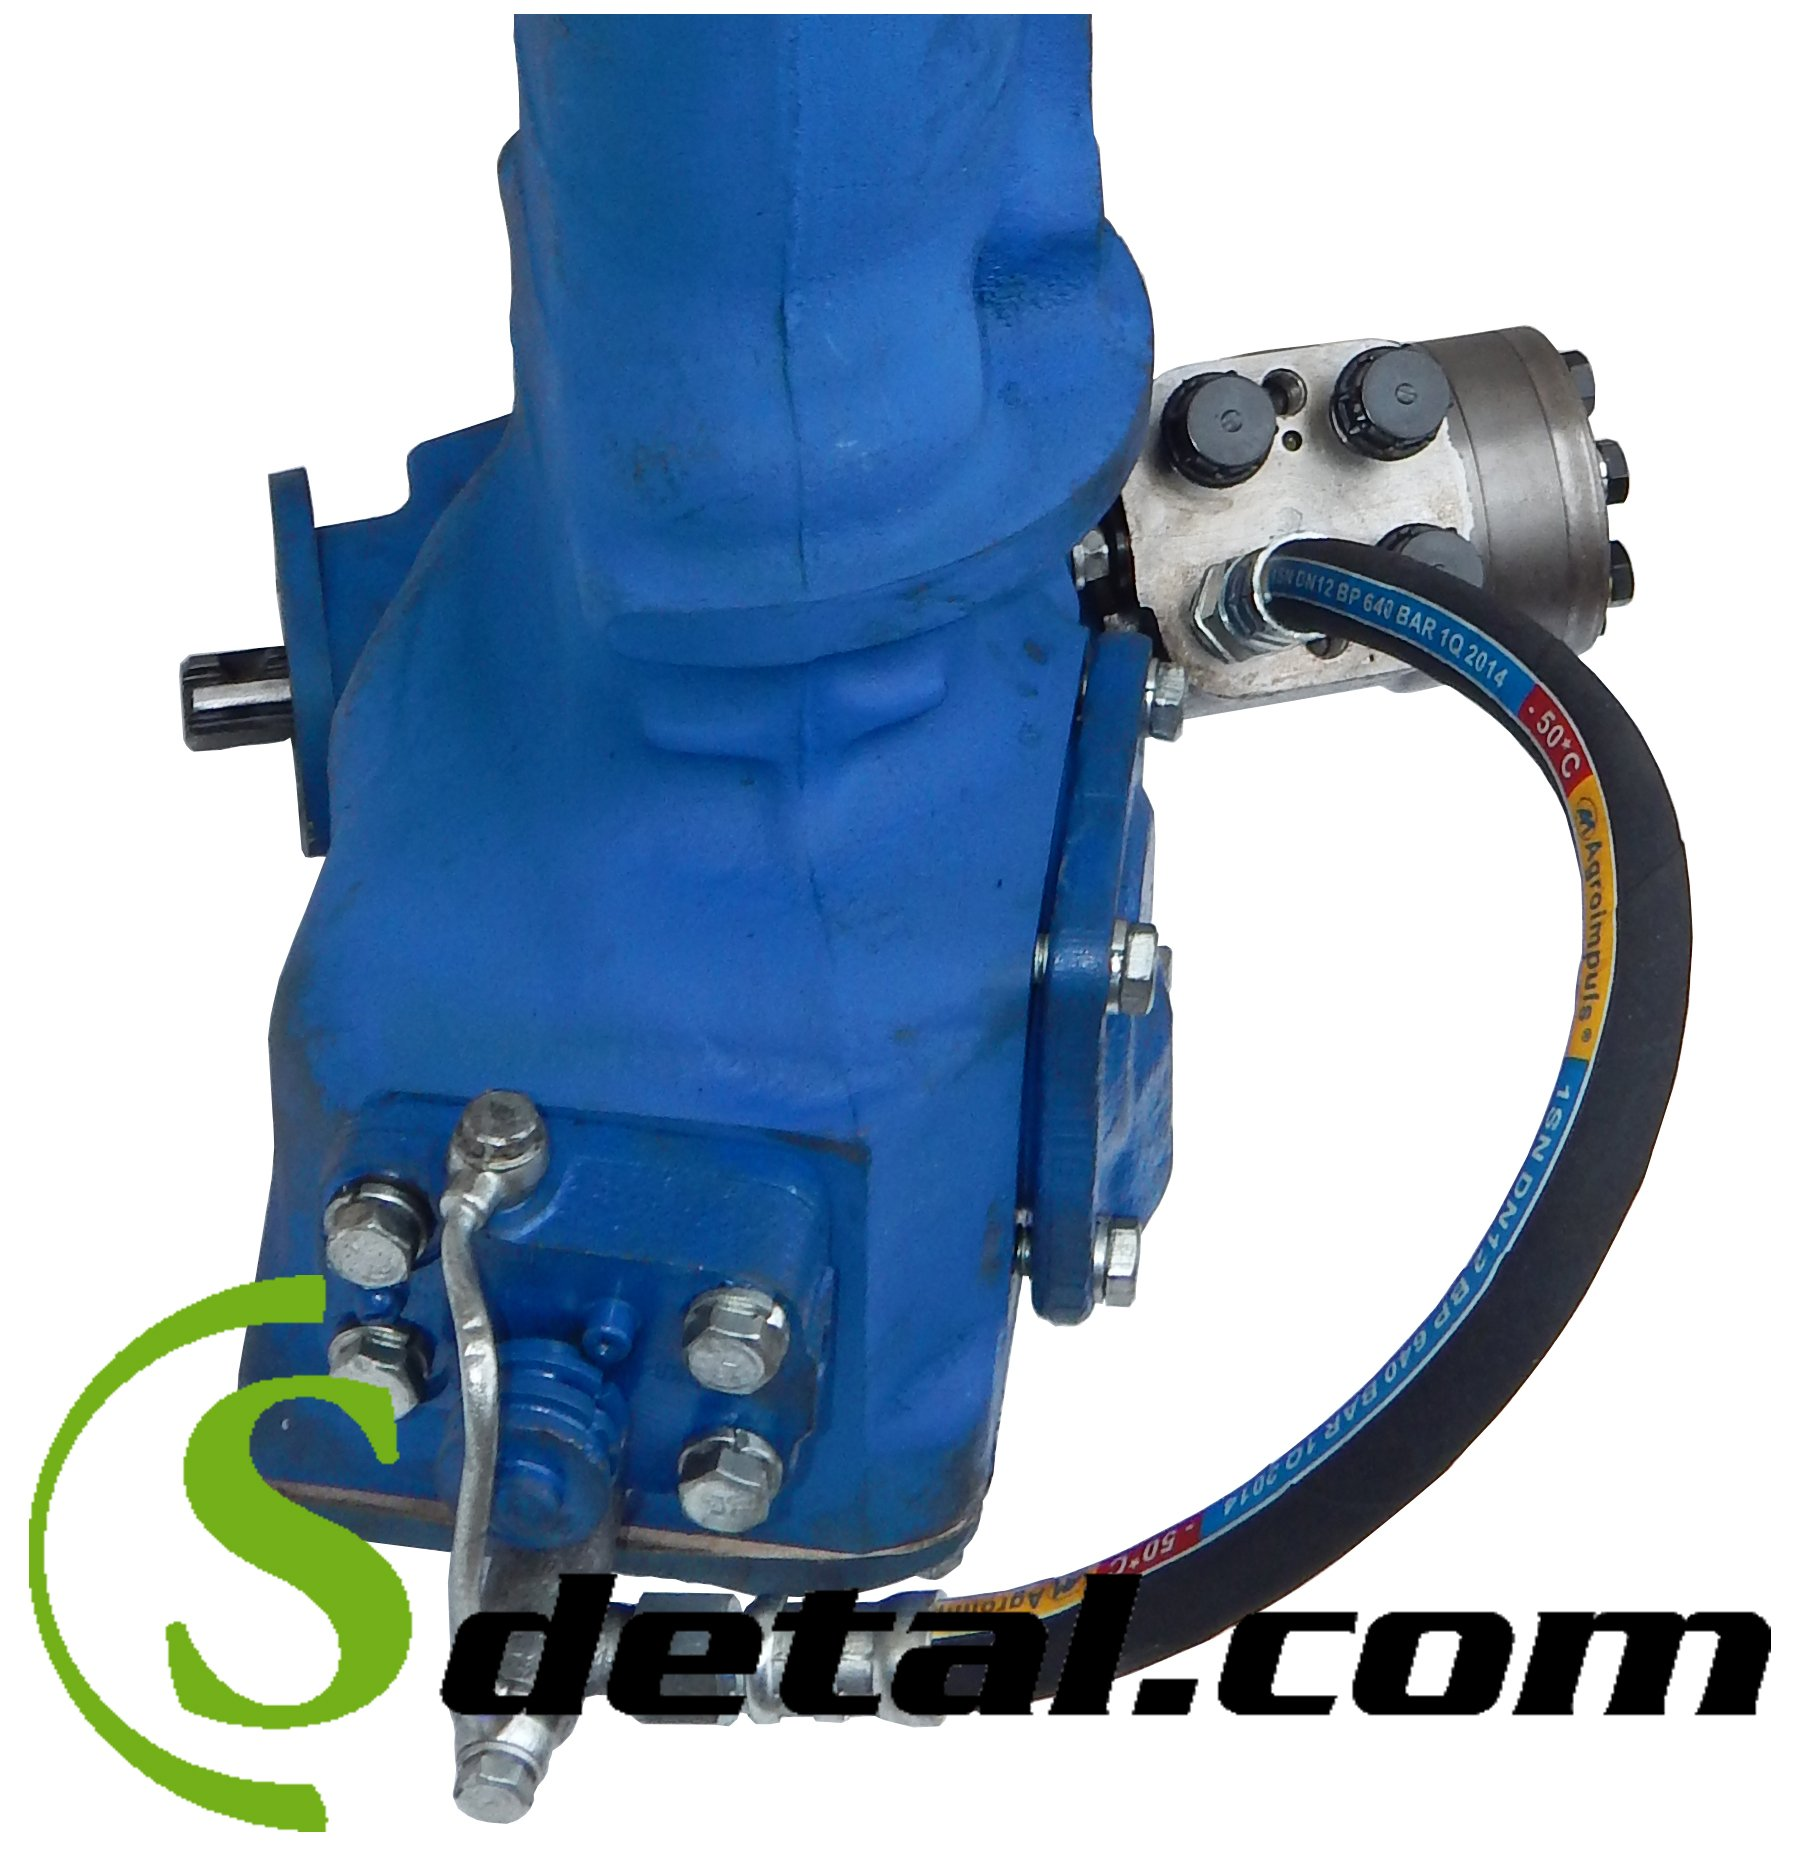 Комплект для установки насоса дозатора на ГУР трактора МТЗ.